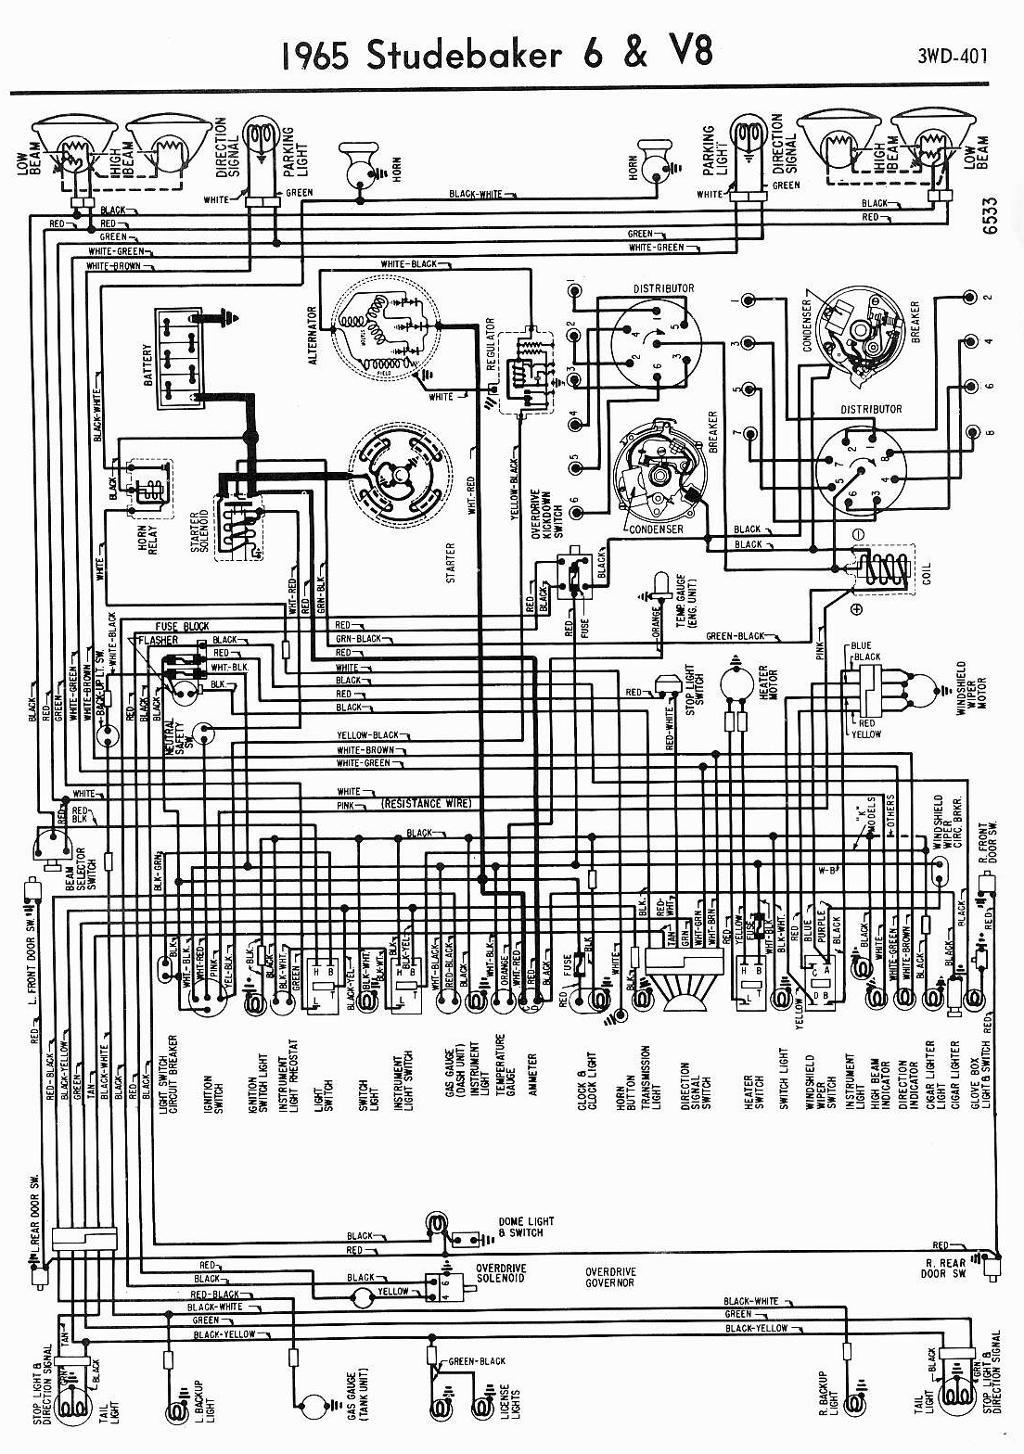 1953 studebaker commander wiring diagram block and schematic 51 studebaker wiring diagram [ 1024 x 1454 Pixel ]